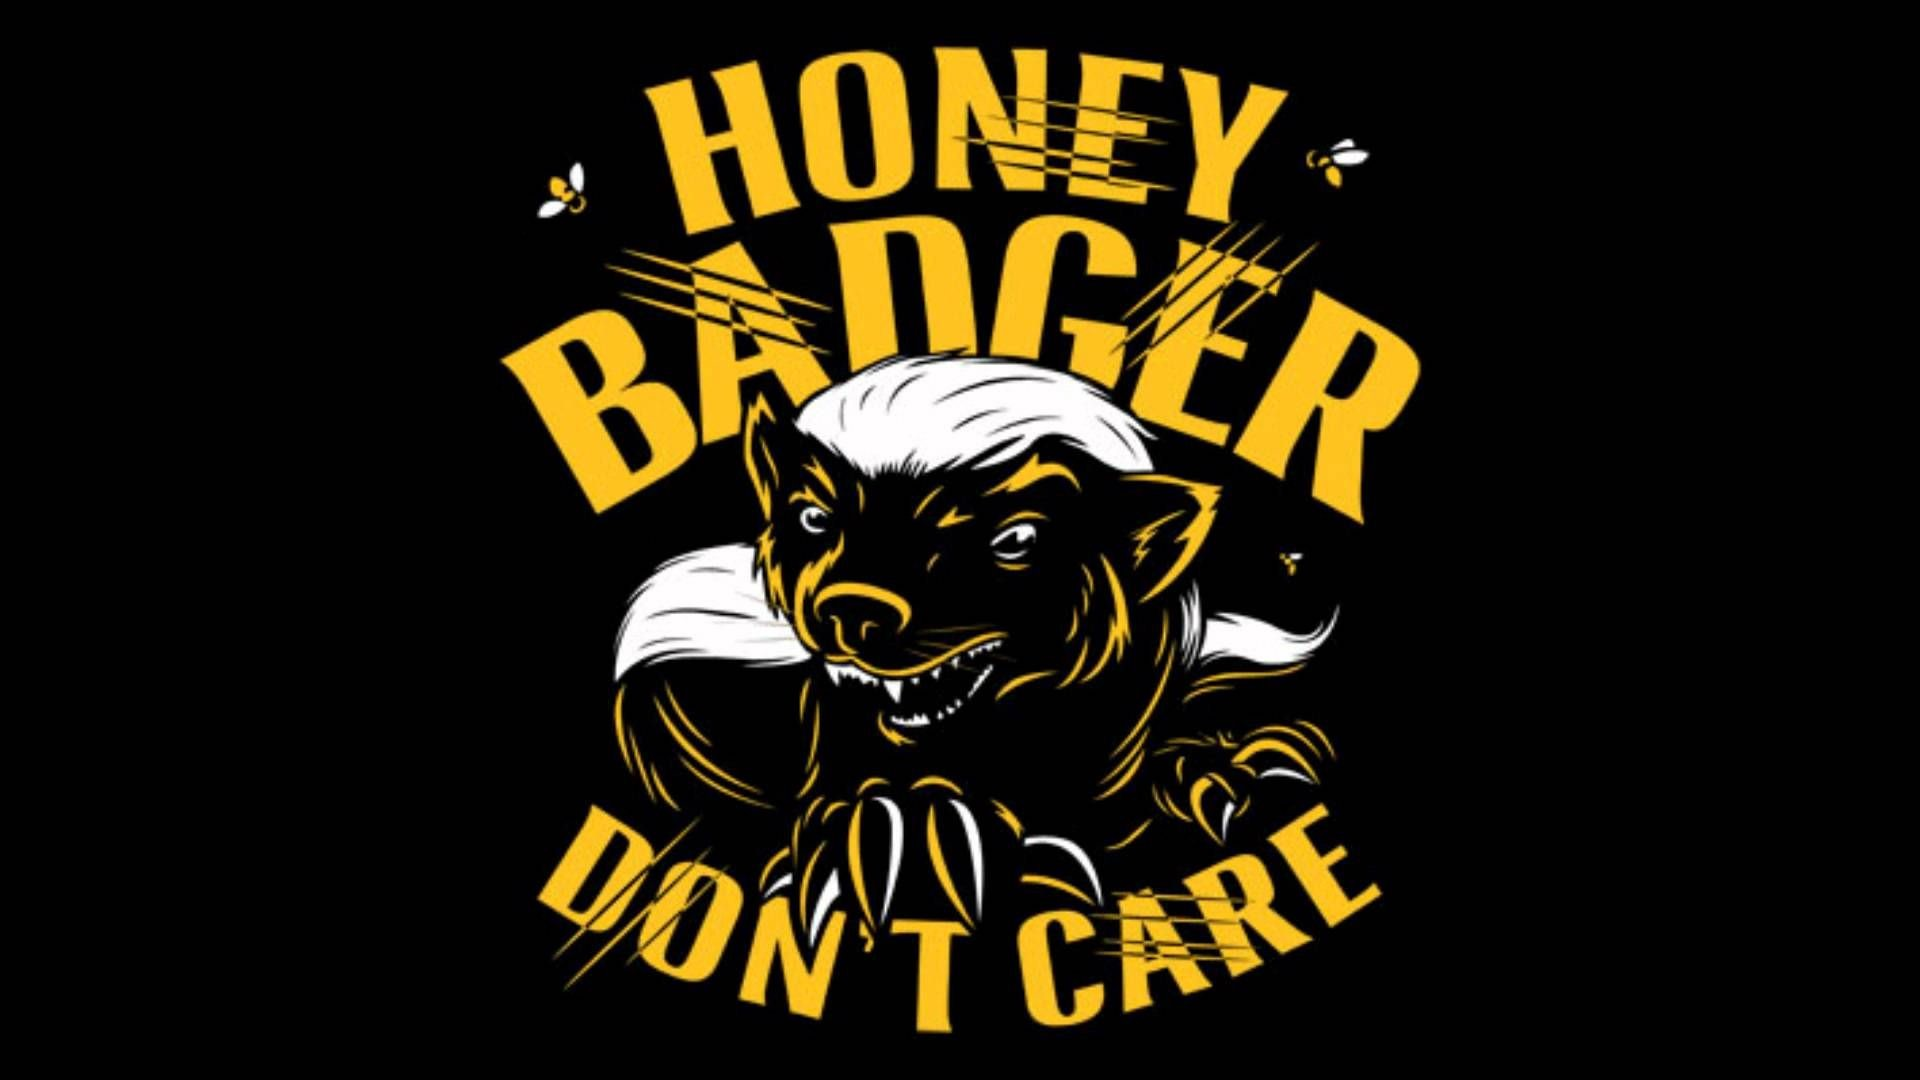 Honey Badger Wallpapers | Honey Badger Backgrounds and .